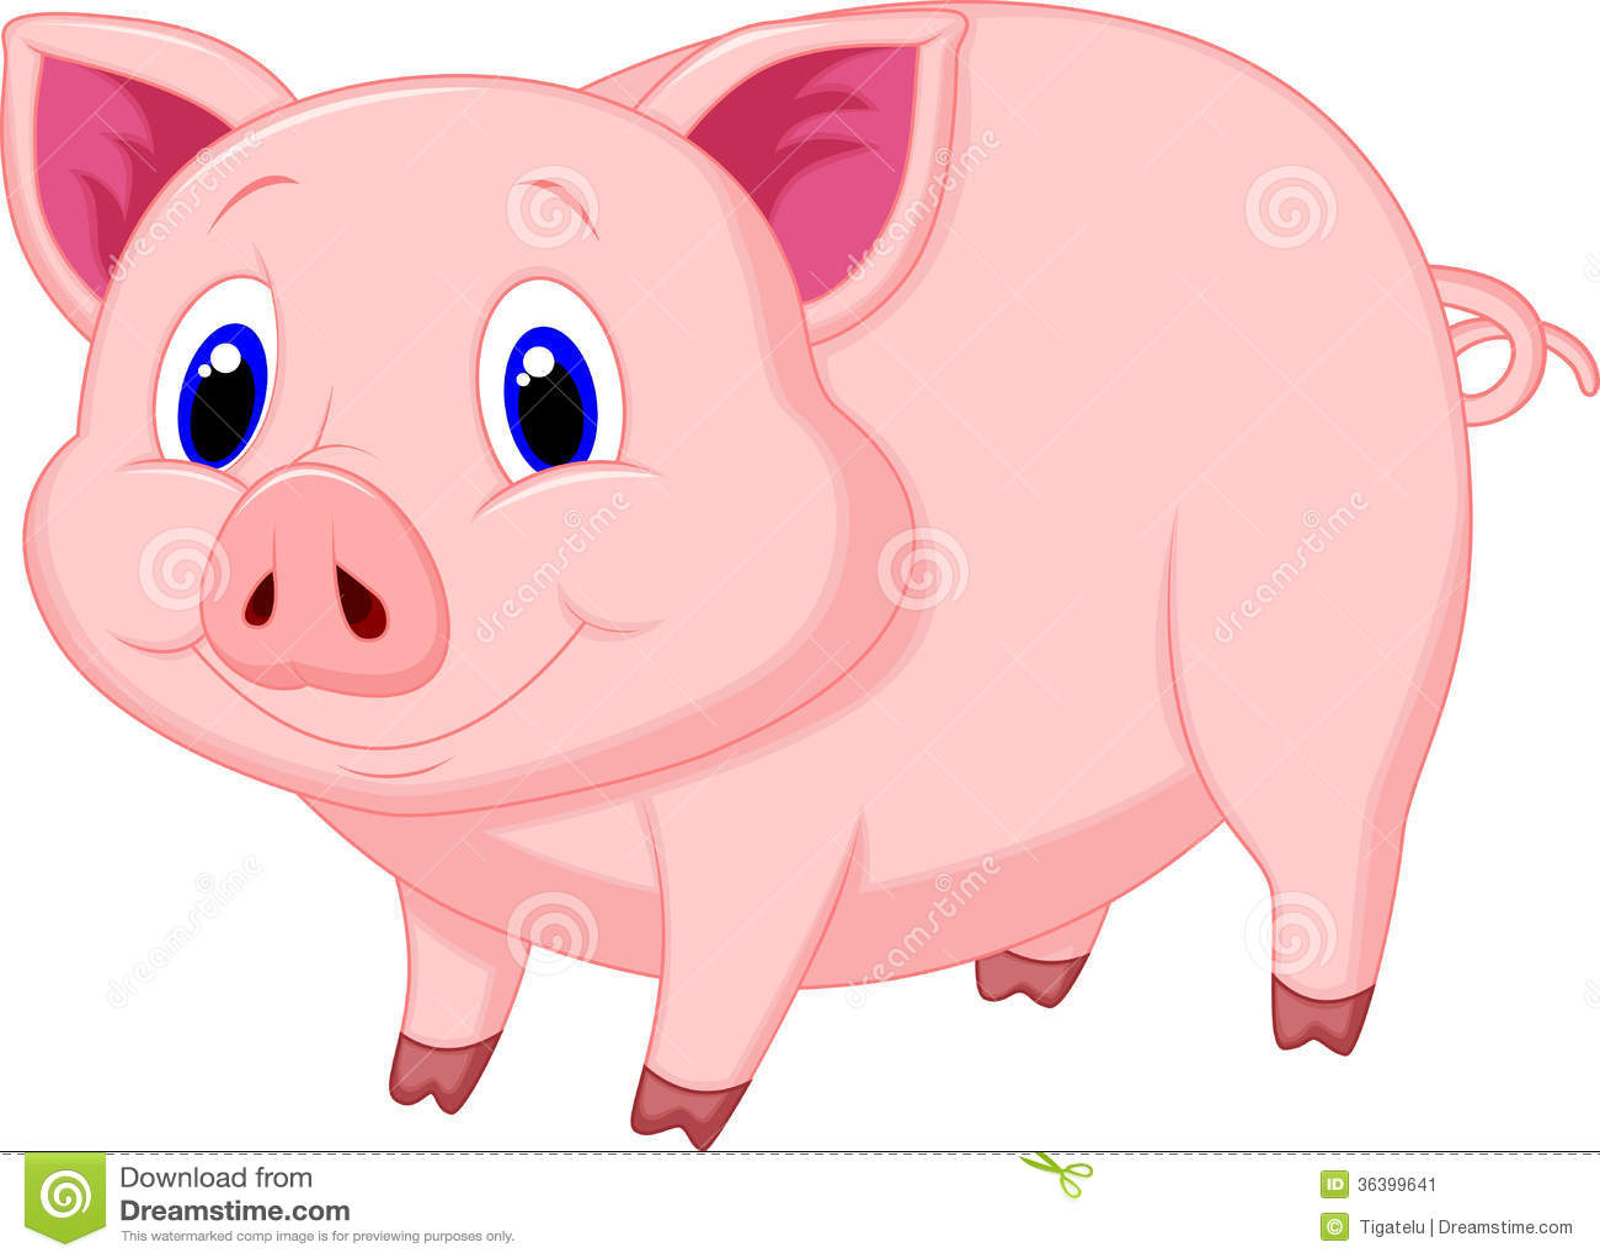 Cute Cartoon Piglets